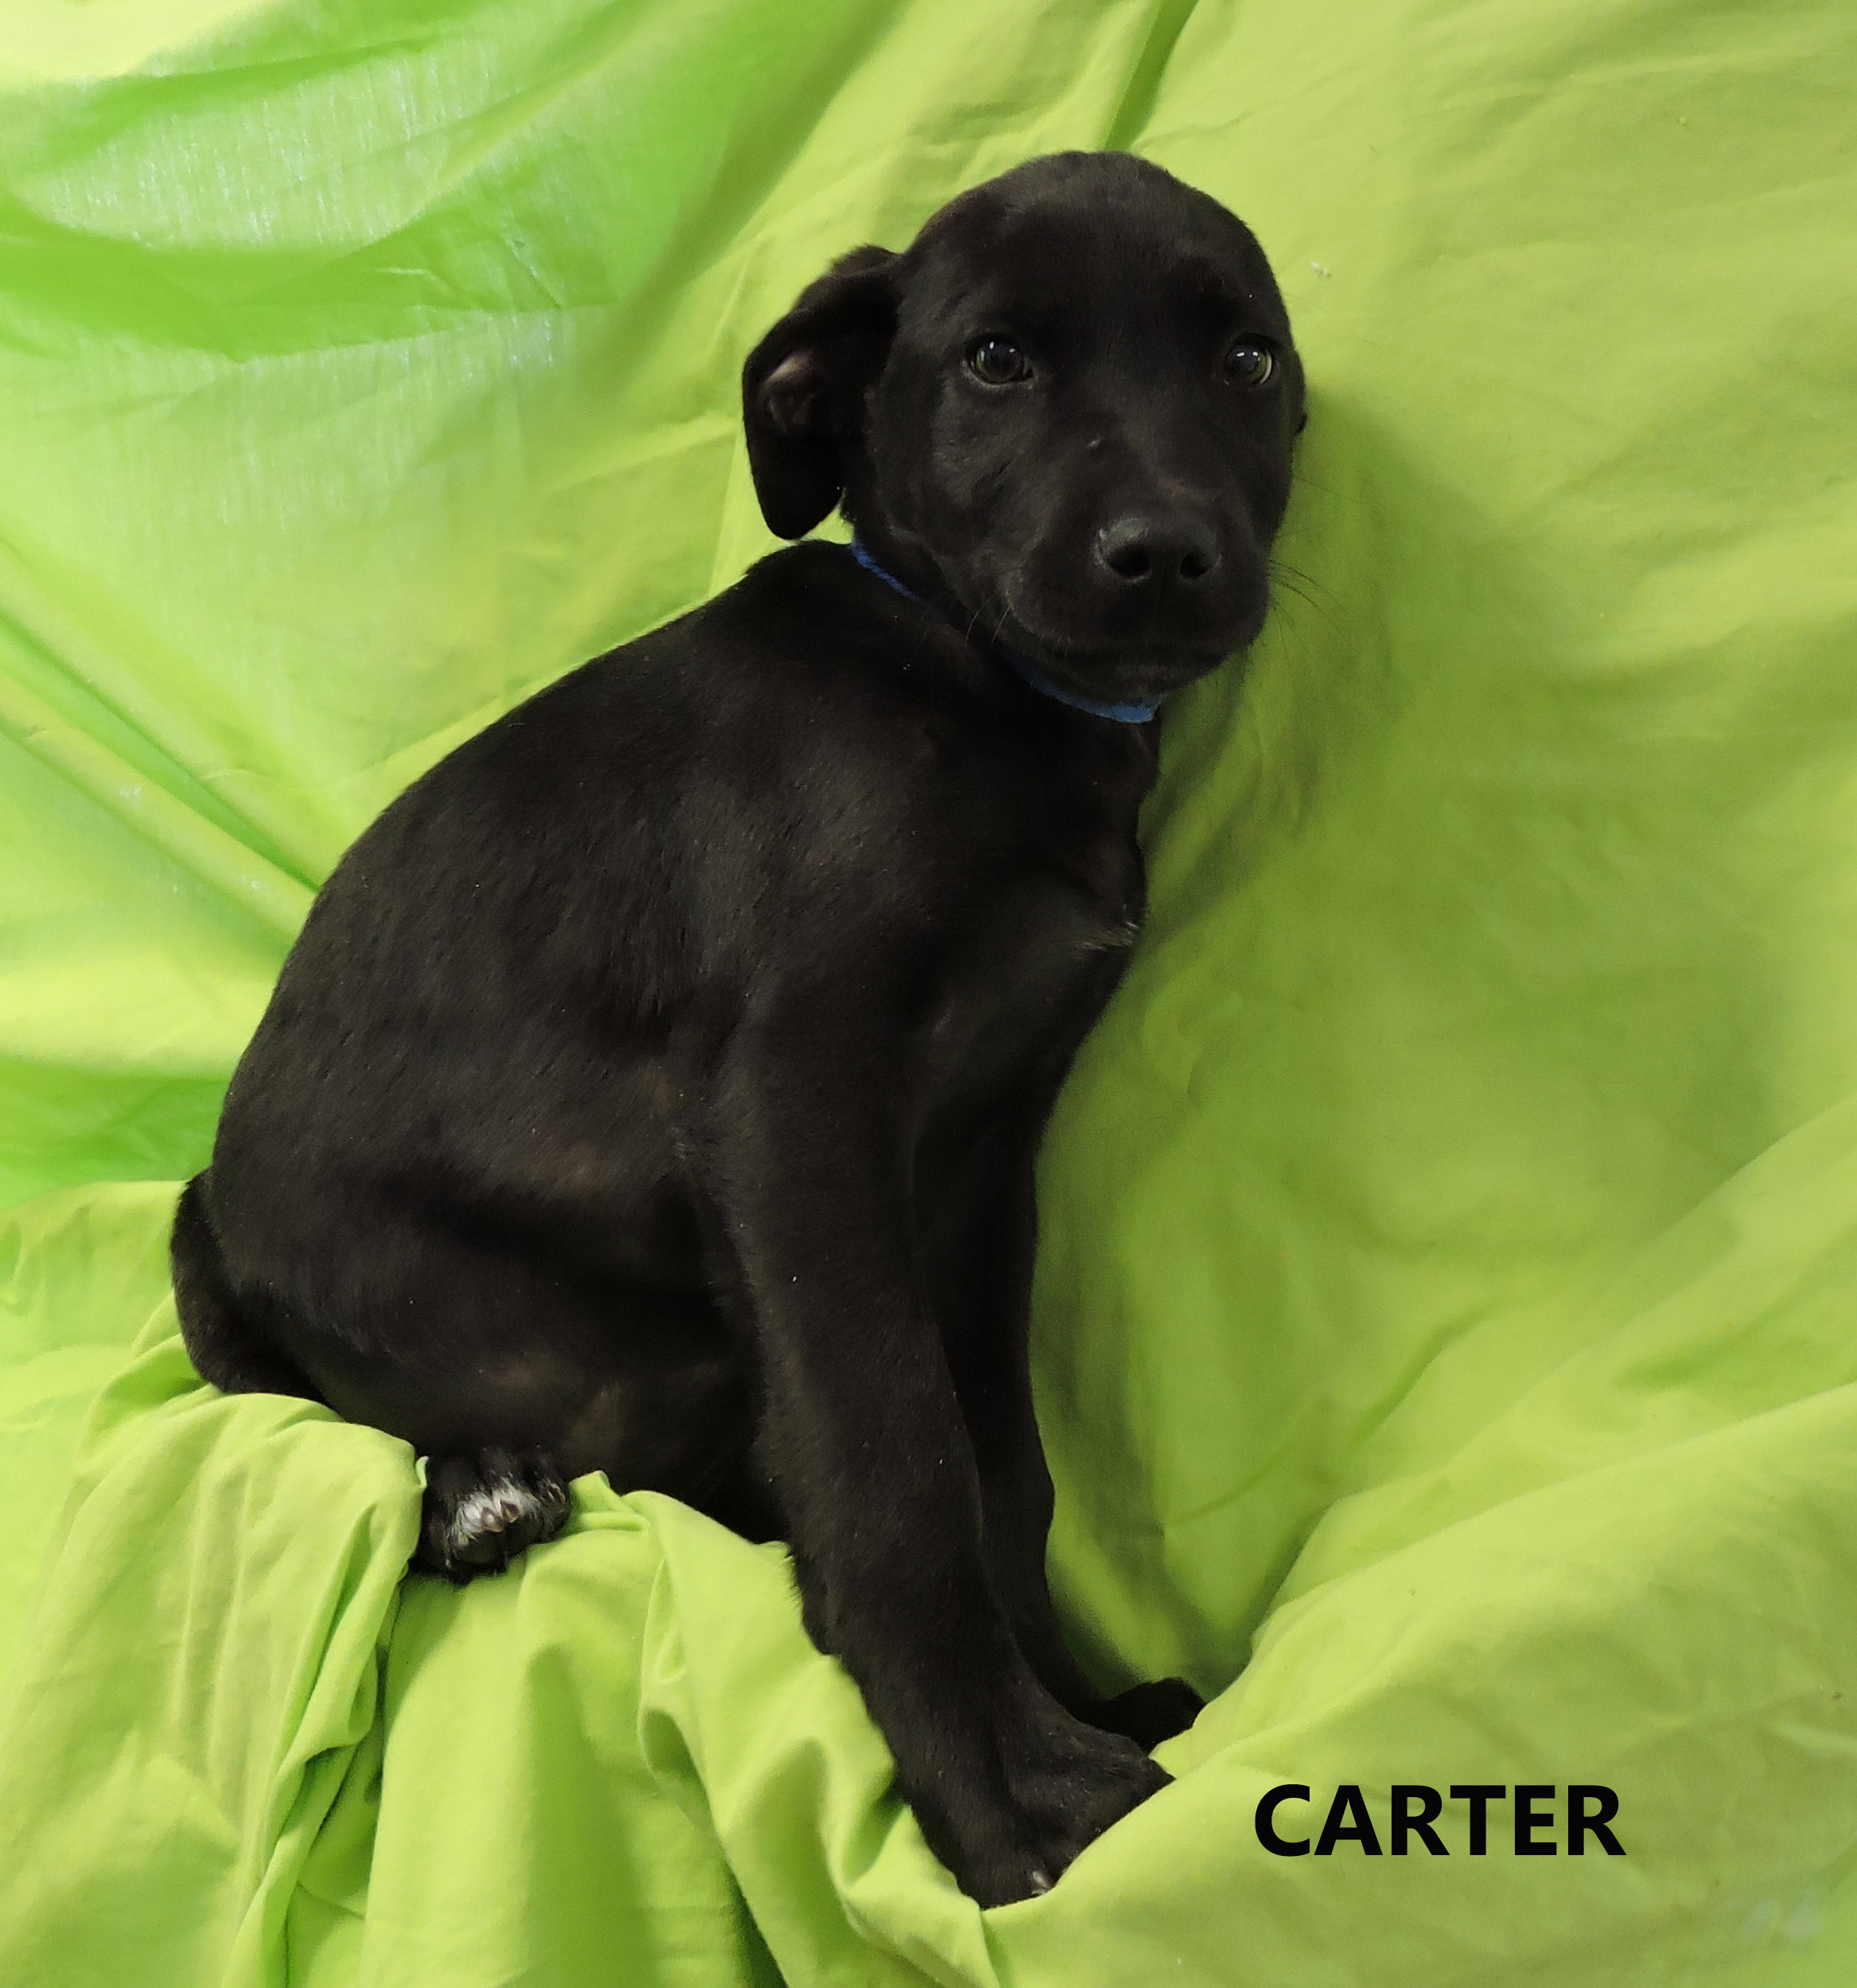 Carter WW